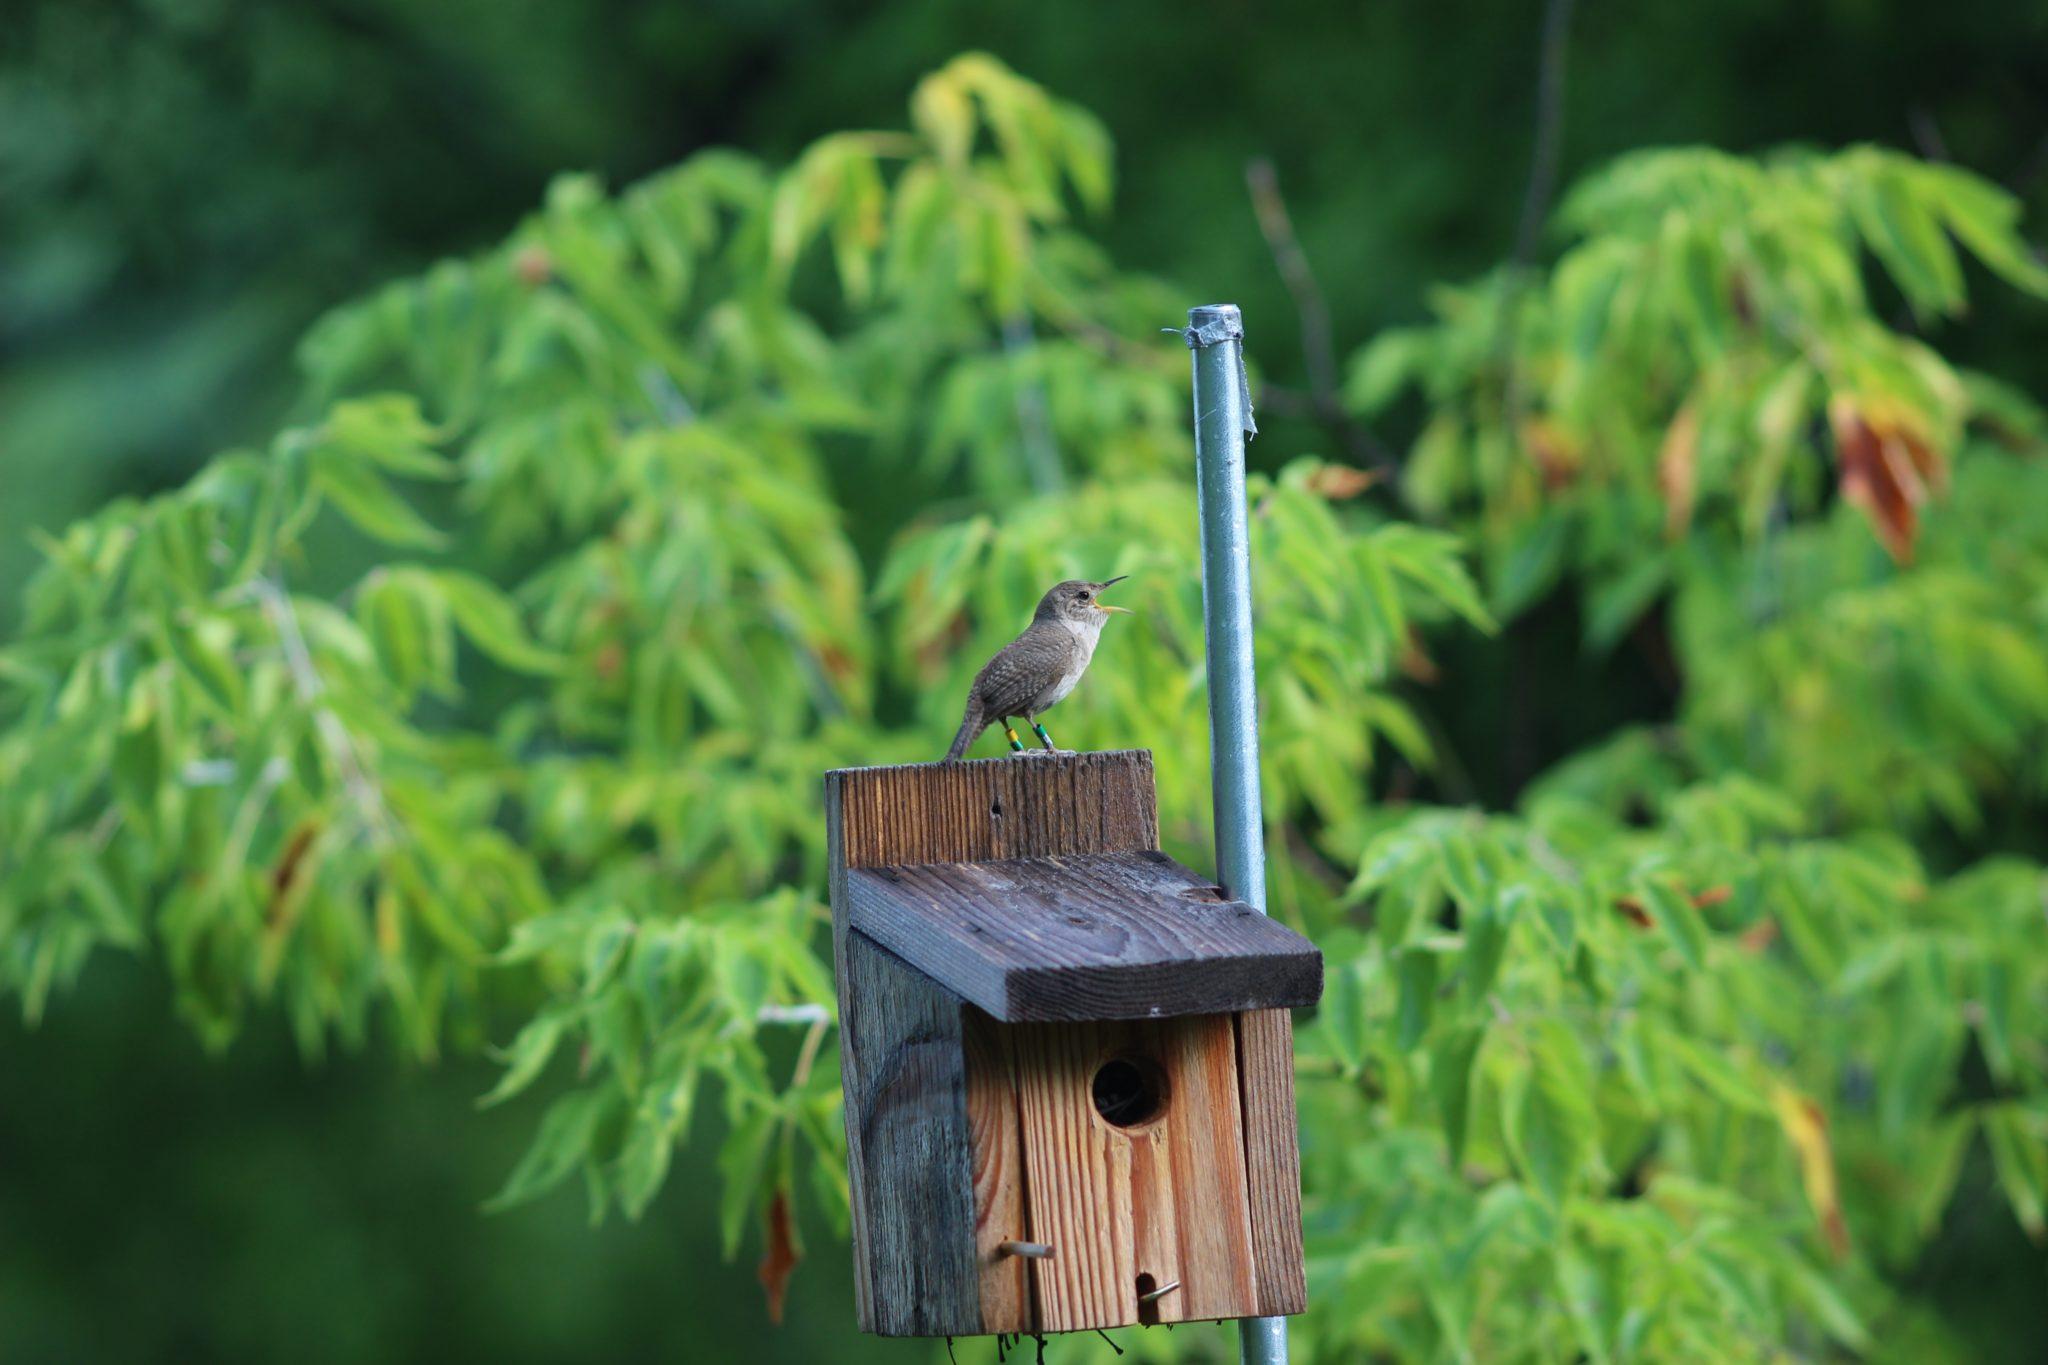 singing house wren